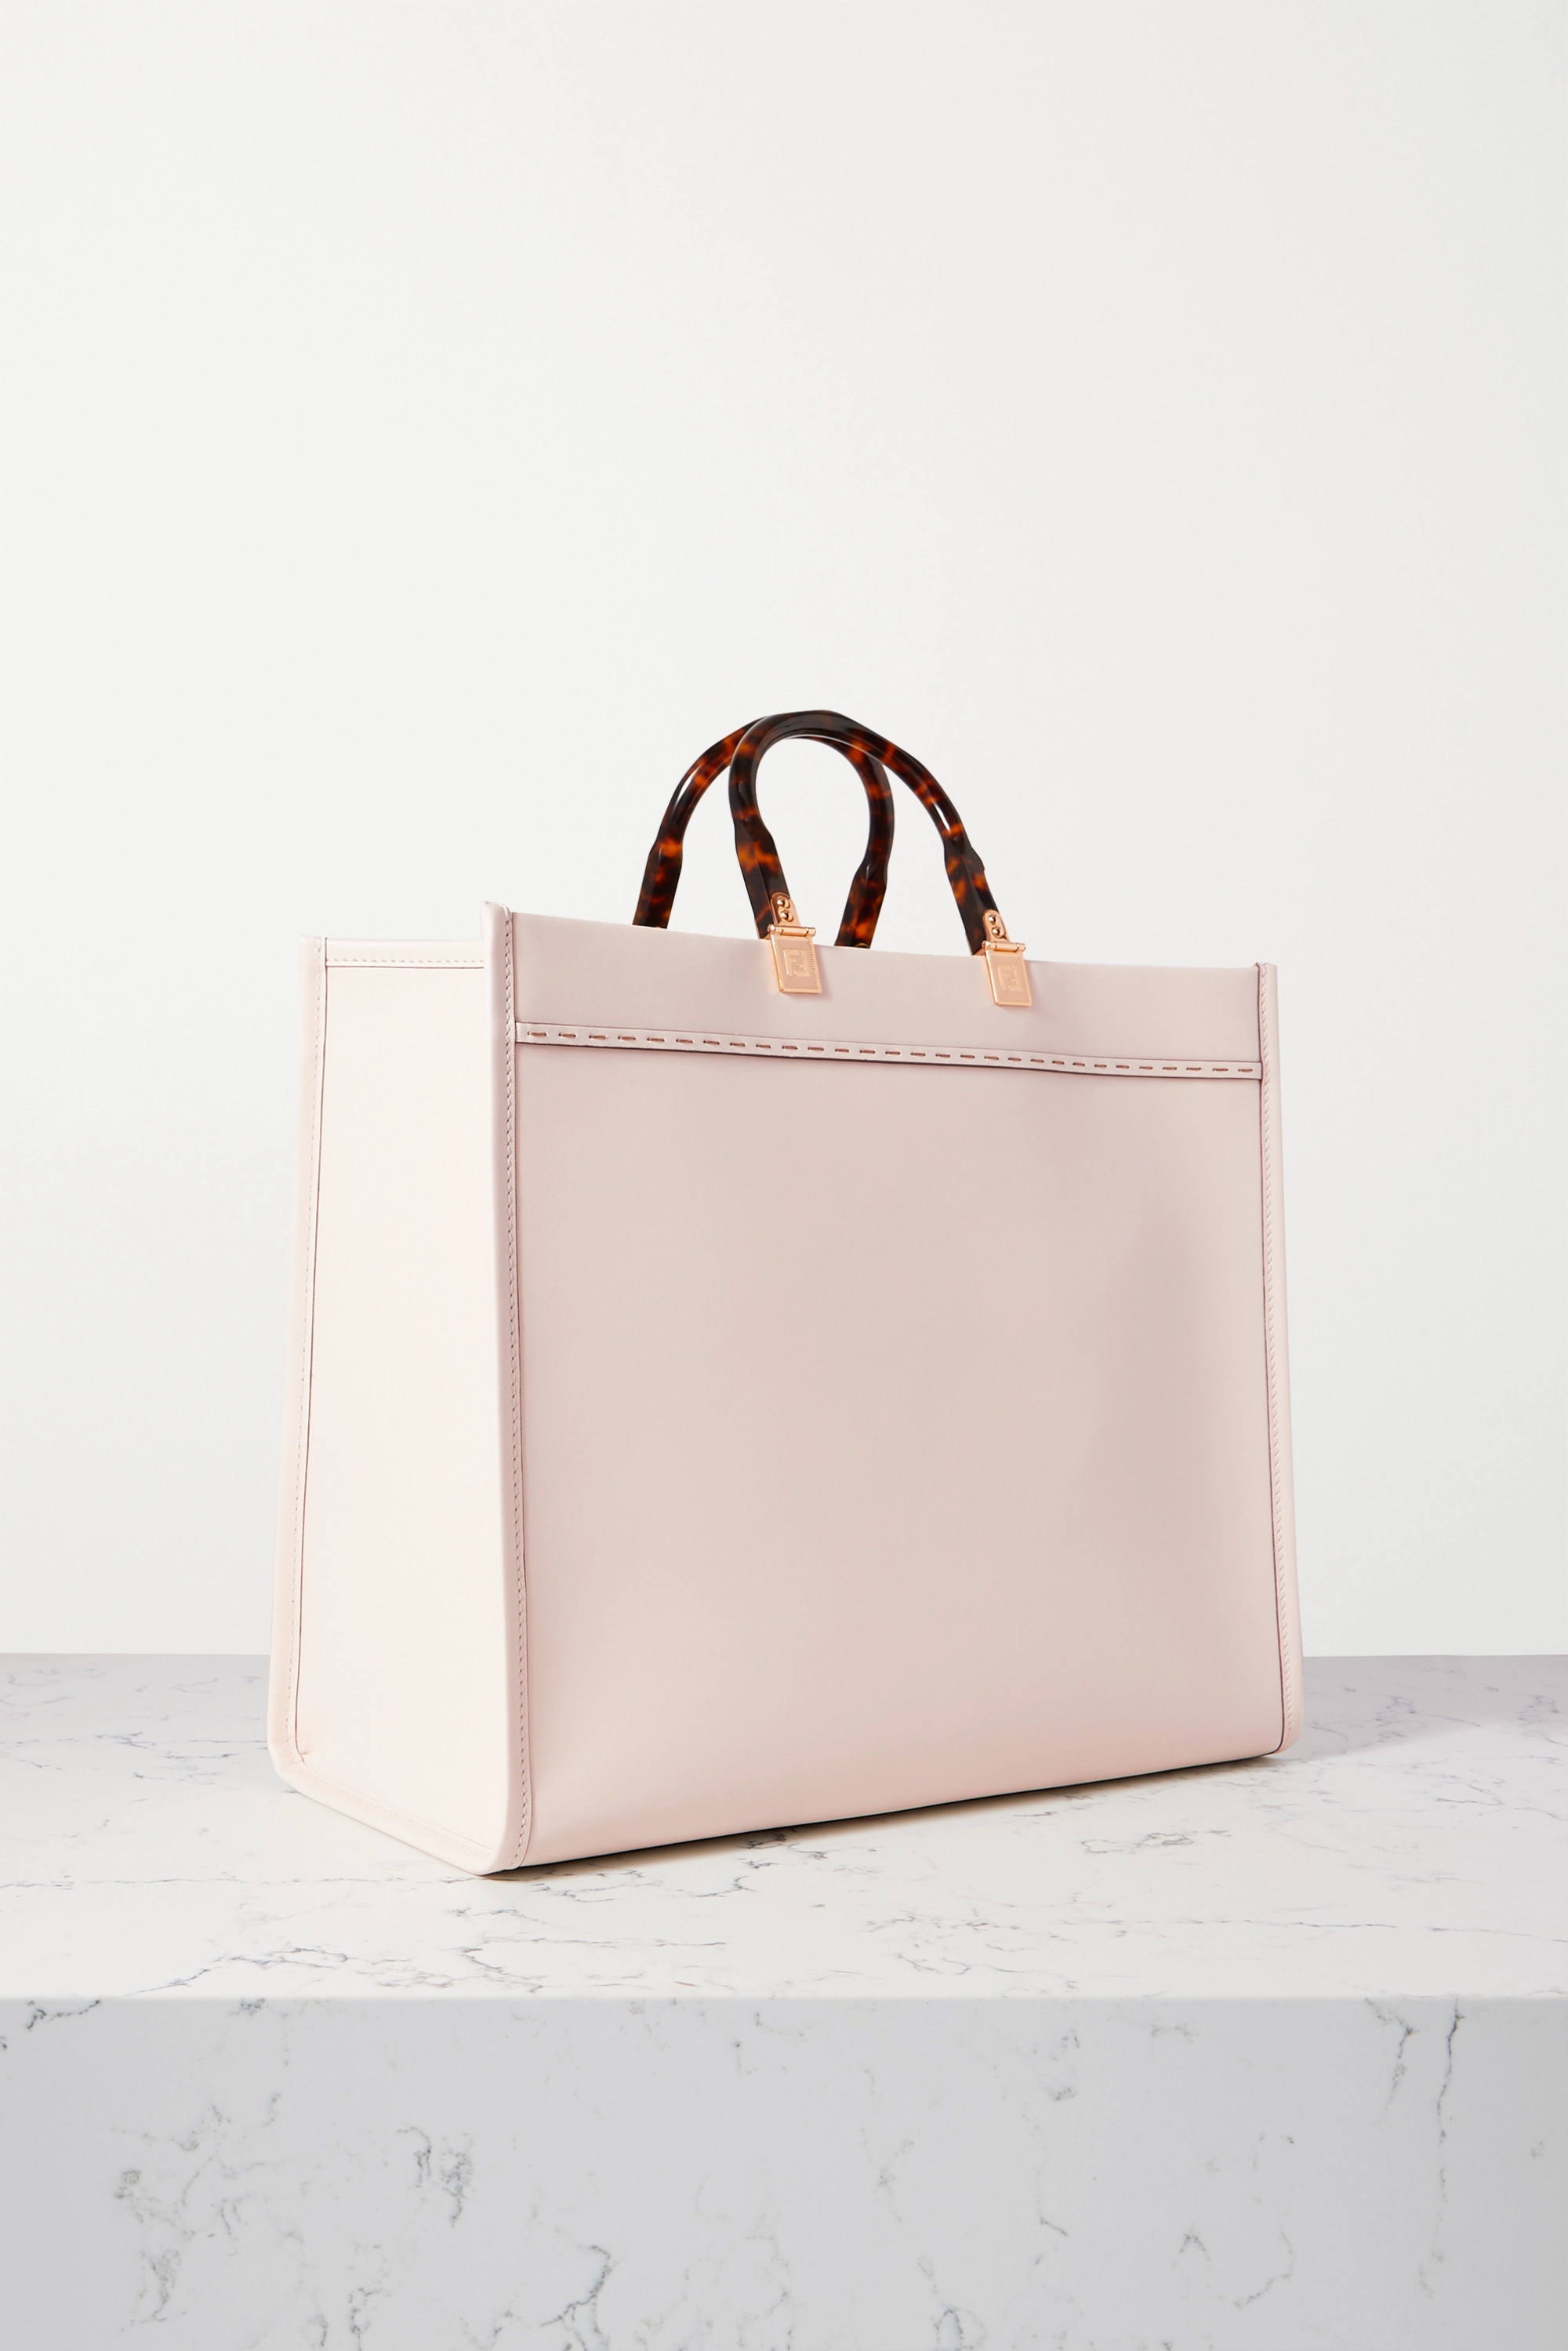 Fendi Sunshine Shopper large embossed leather tote